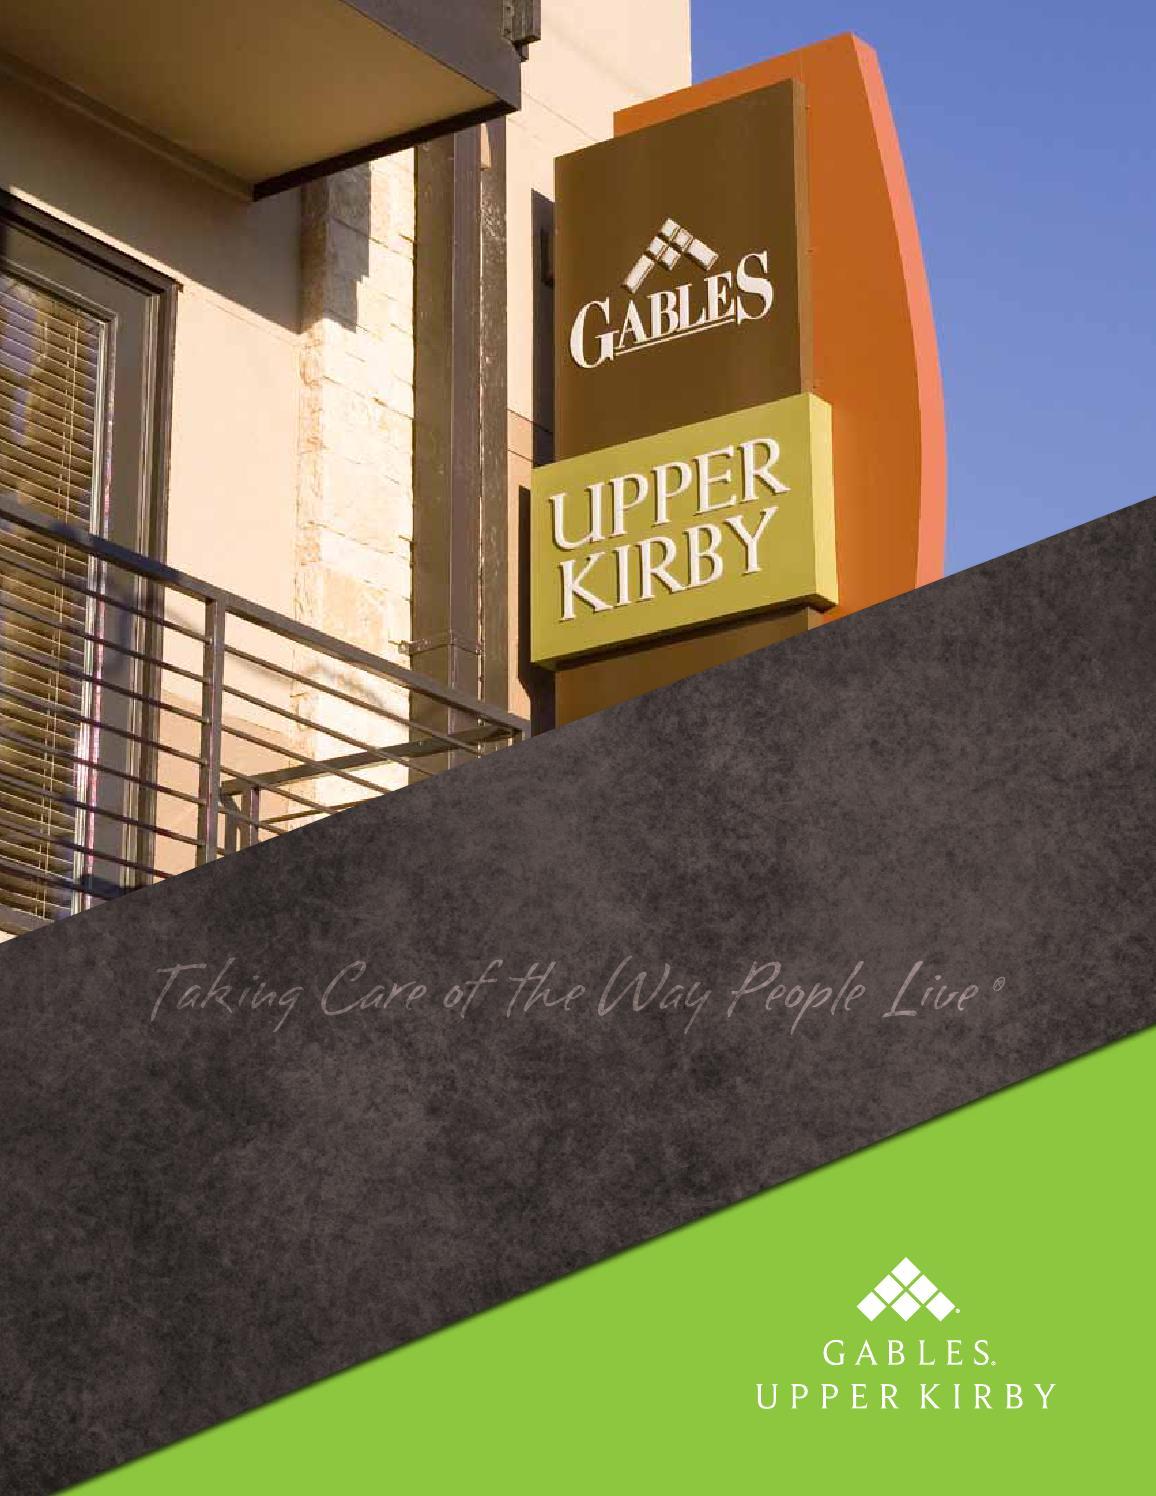 Gables Upper Kirby Ebrochure By Gables Residential Issuu